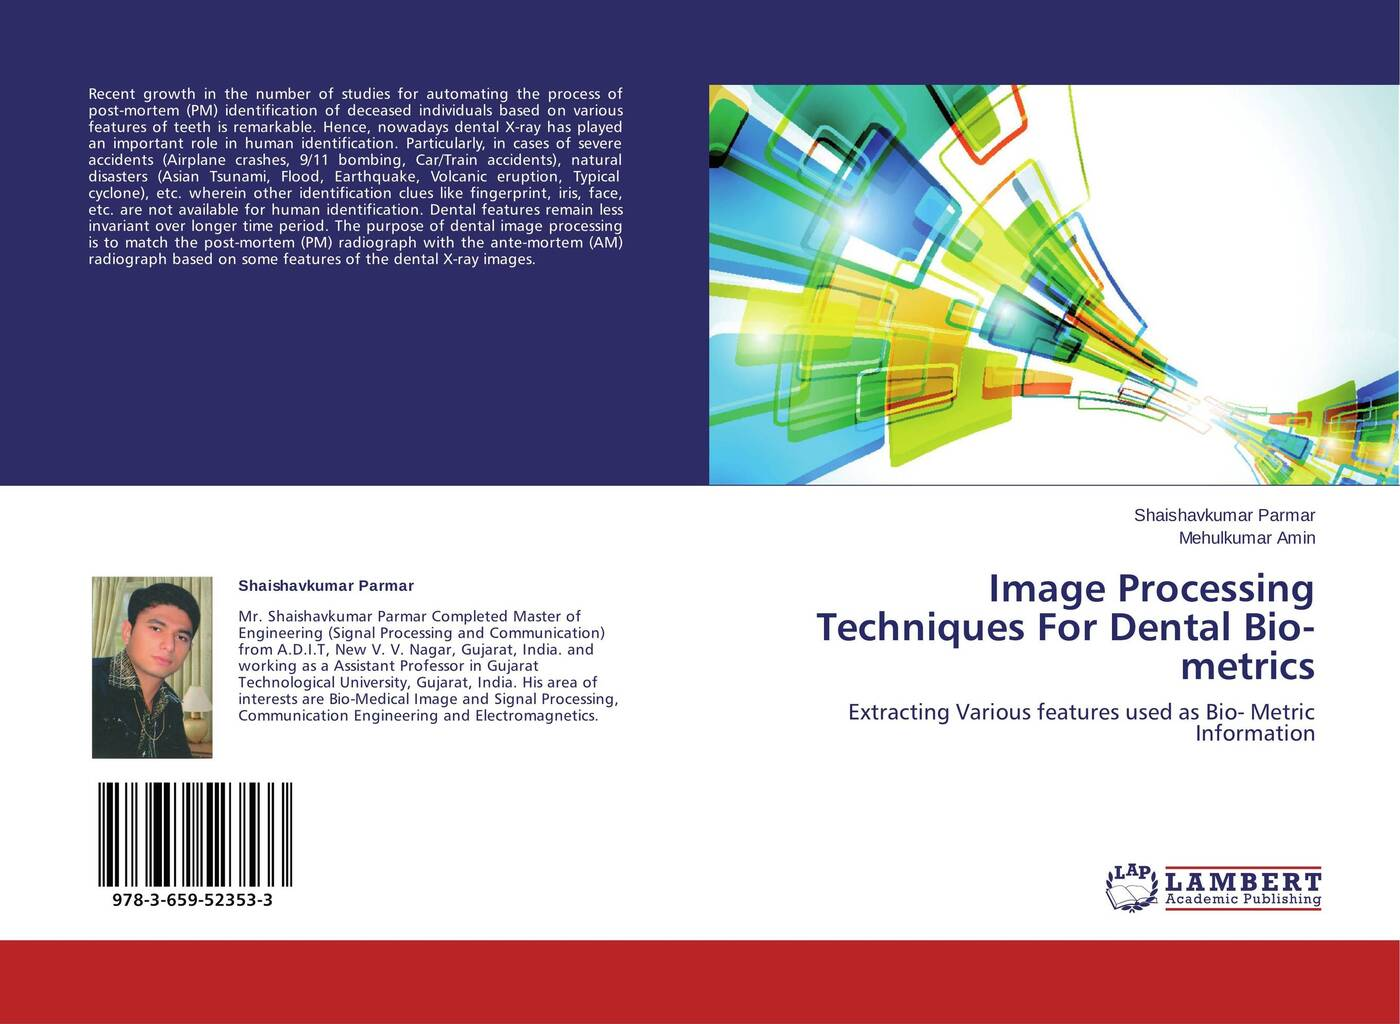 Shaishavkumar Parmar and Mehulkumar Amin Image Processing Techniques For Dental Bio-metrics 100 pcs dental x ray film size 30 x 40mm for dental x ray reader scanner machine